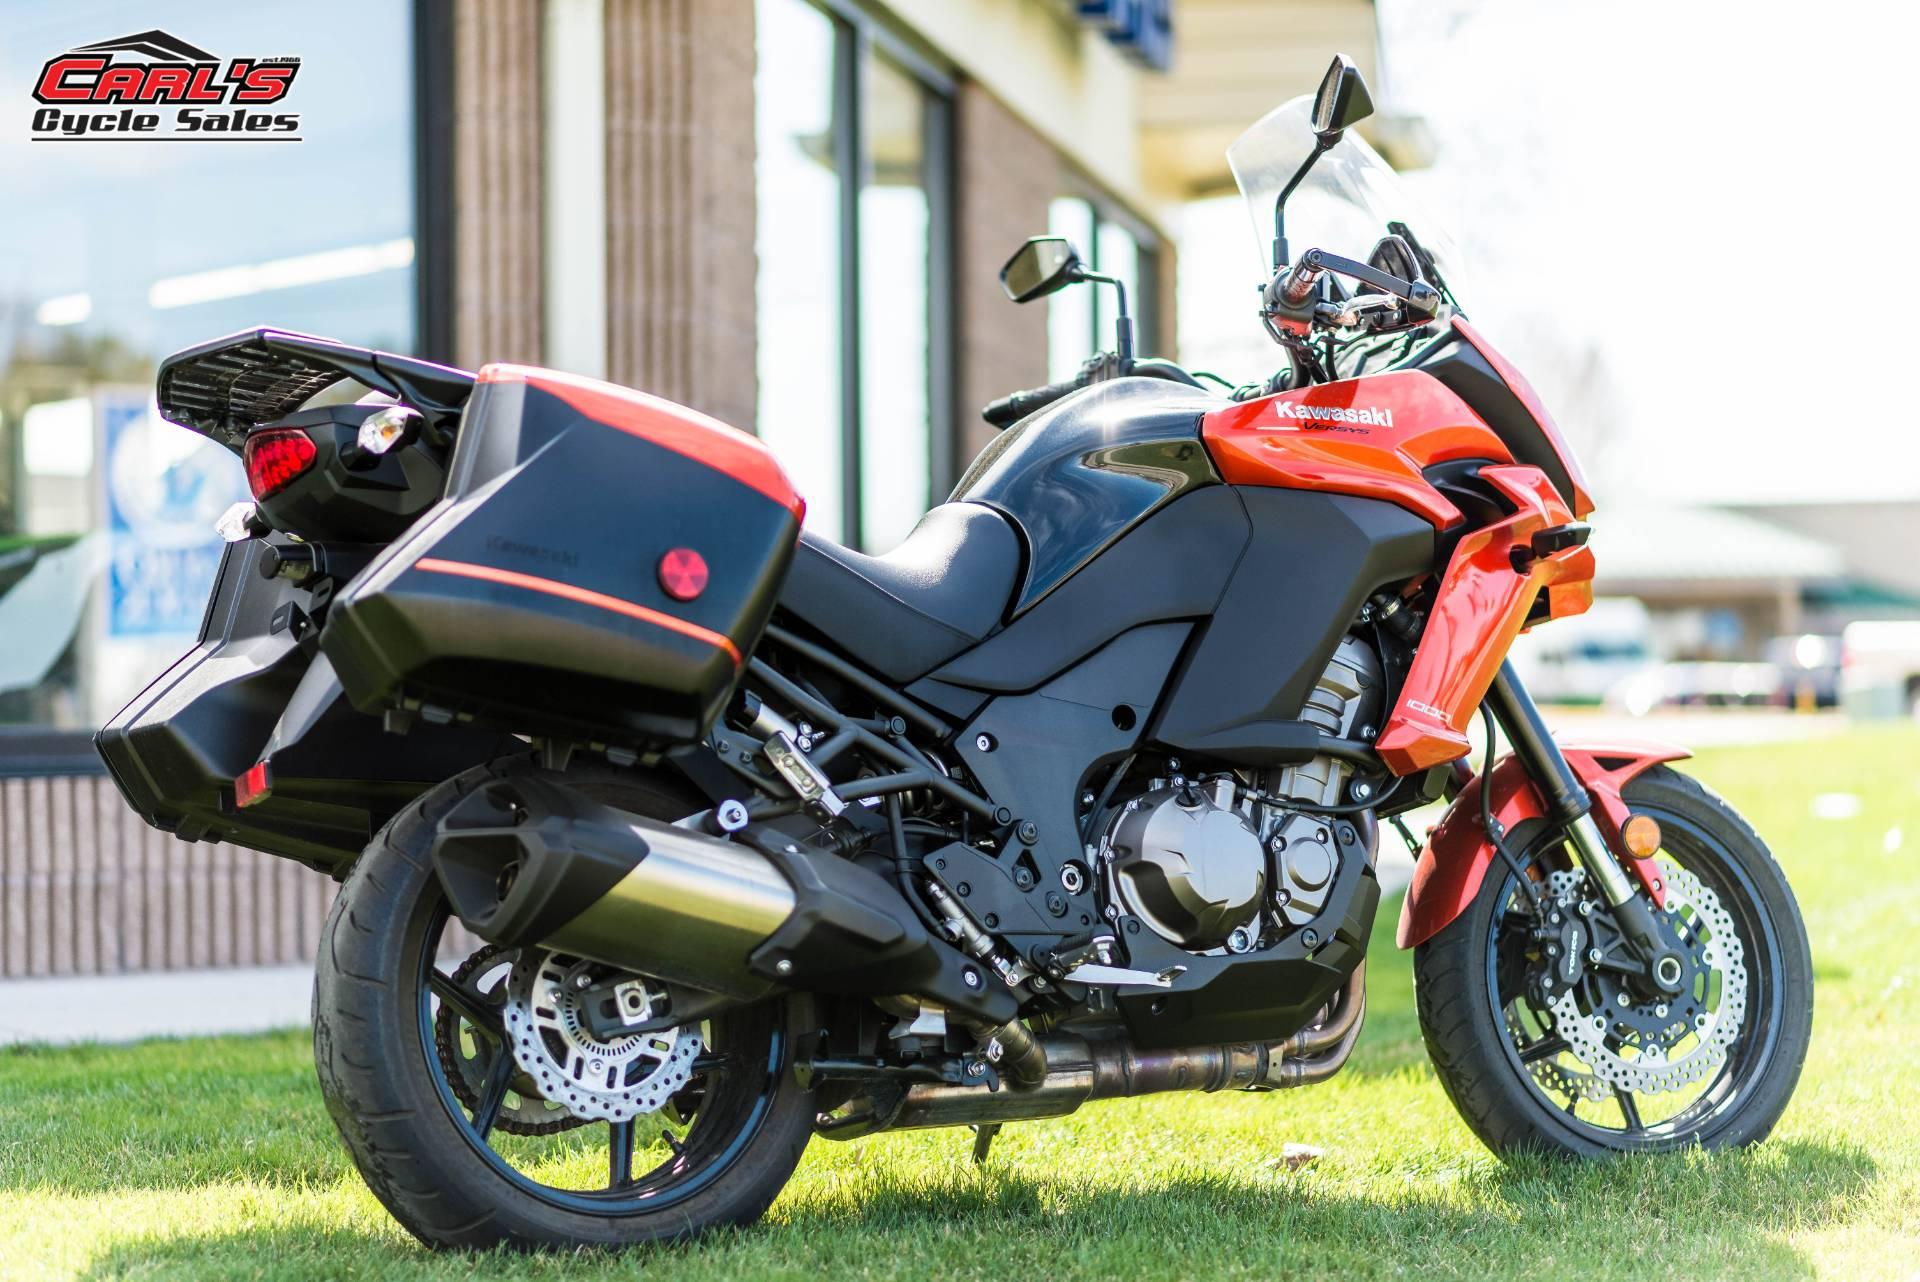 2015 Kawasaki Versys® 1000 LT in Boise, Idaho